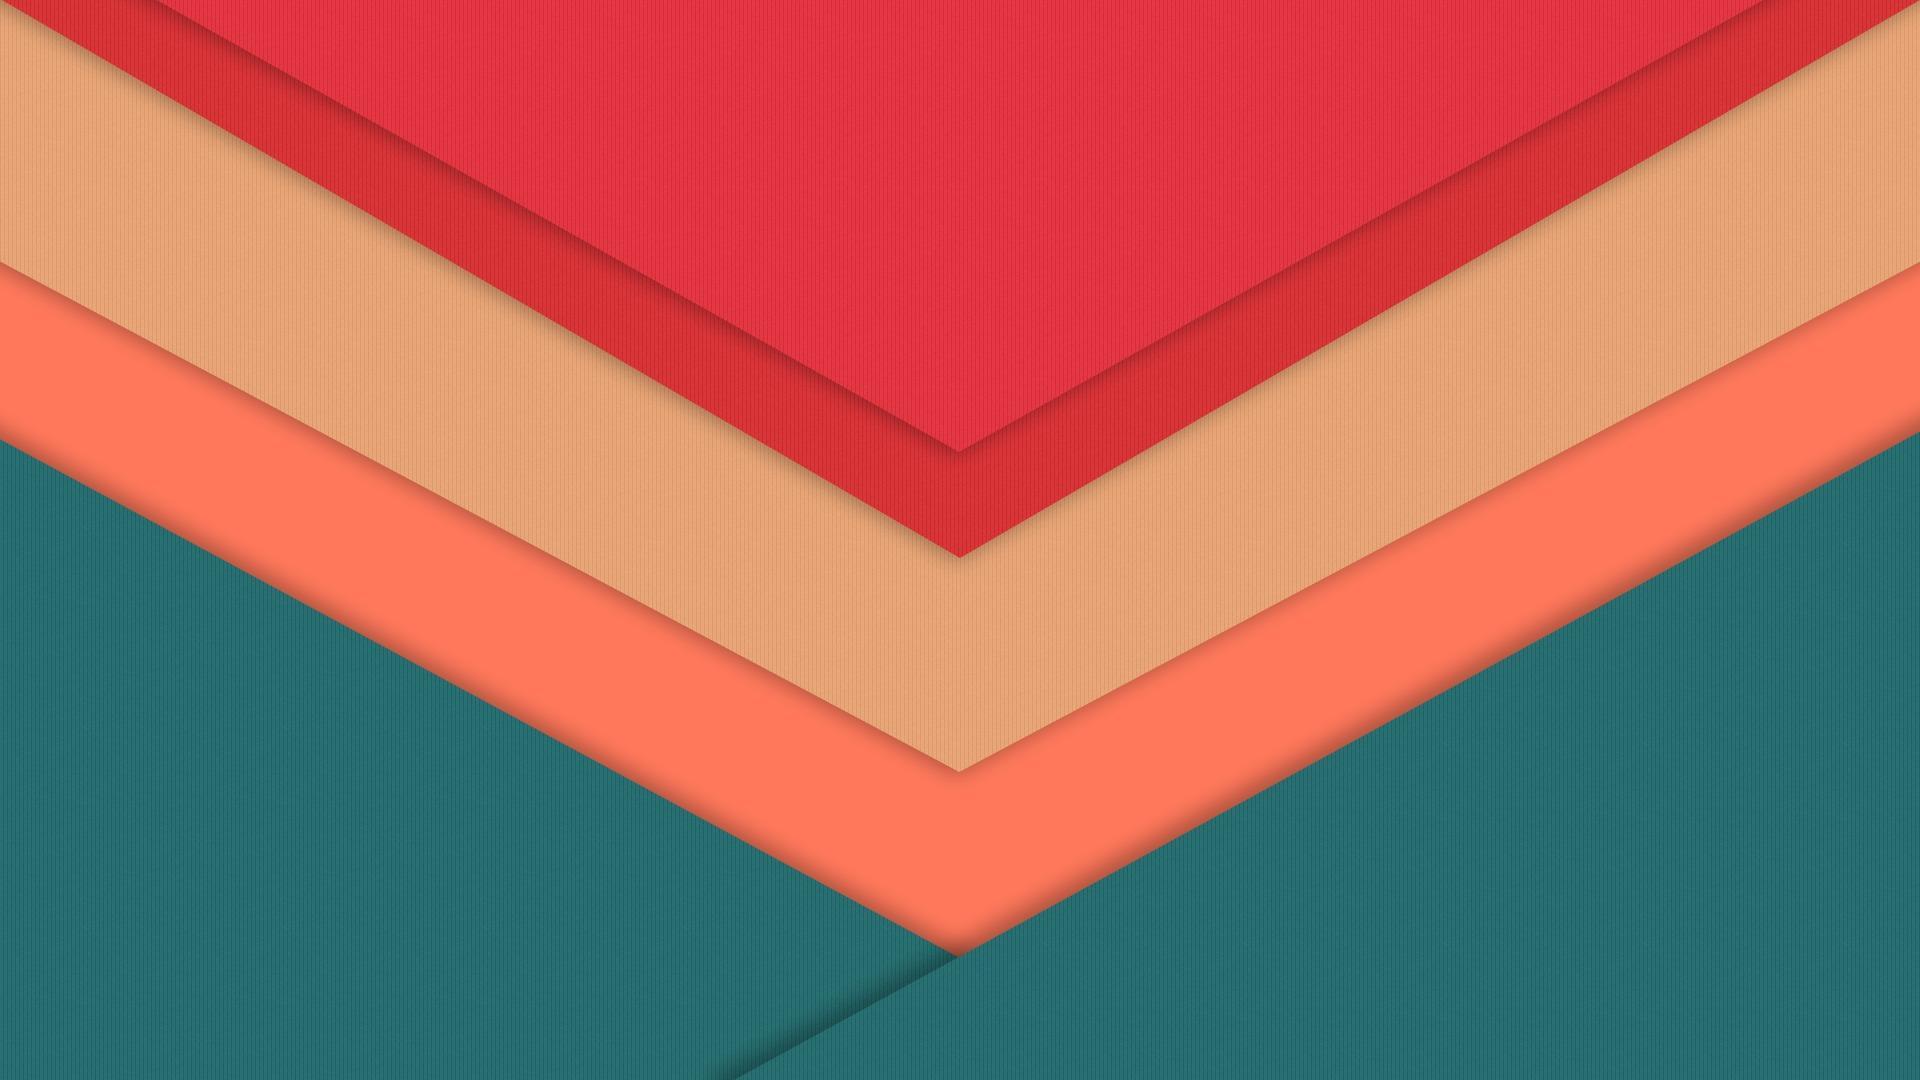 material design желтый красный  № 2972610 без смс